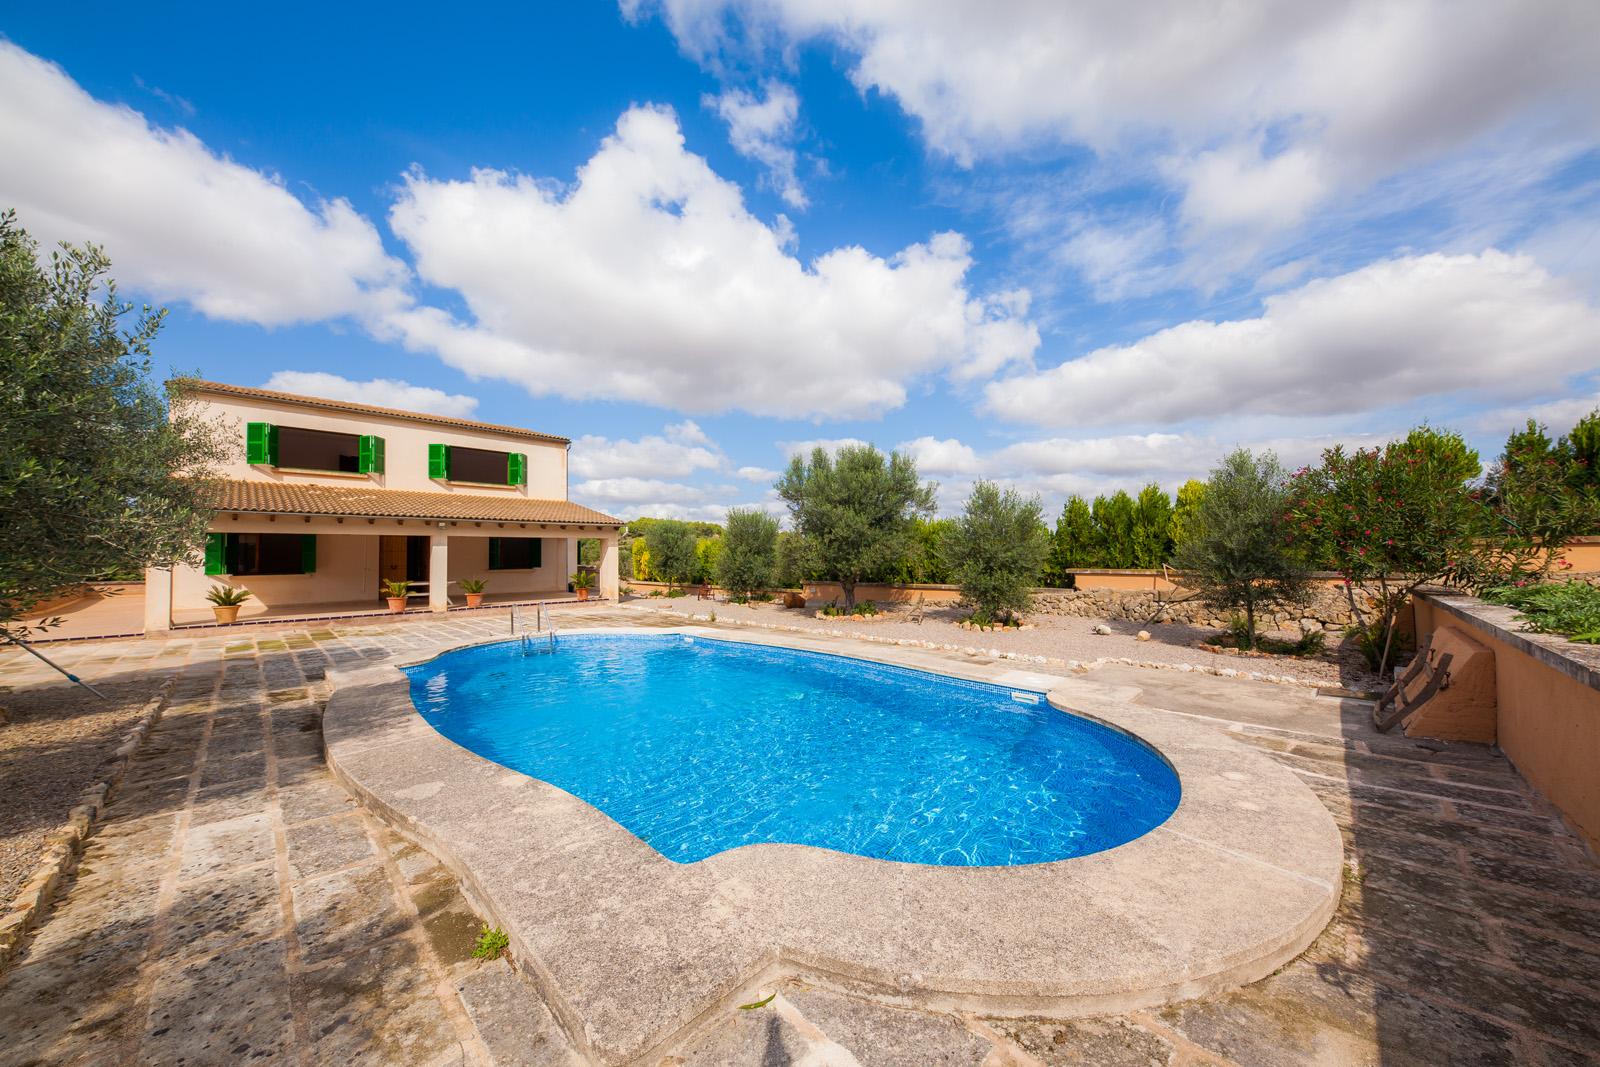 Miete Haus  Vilafranca de bonany